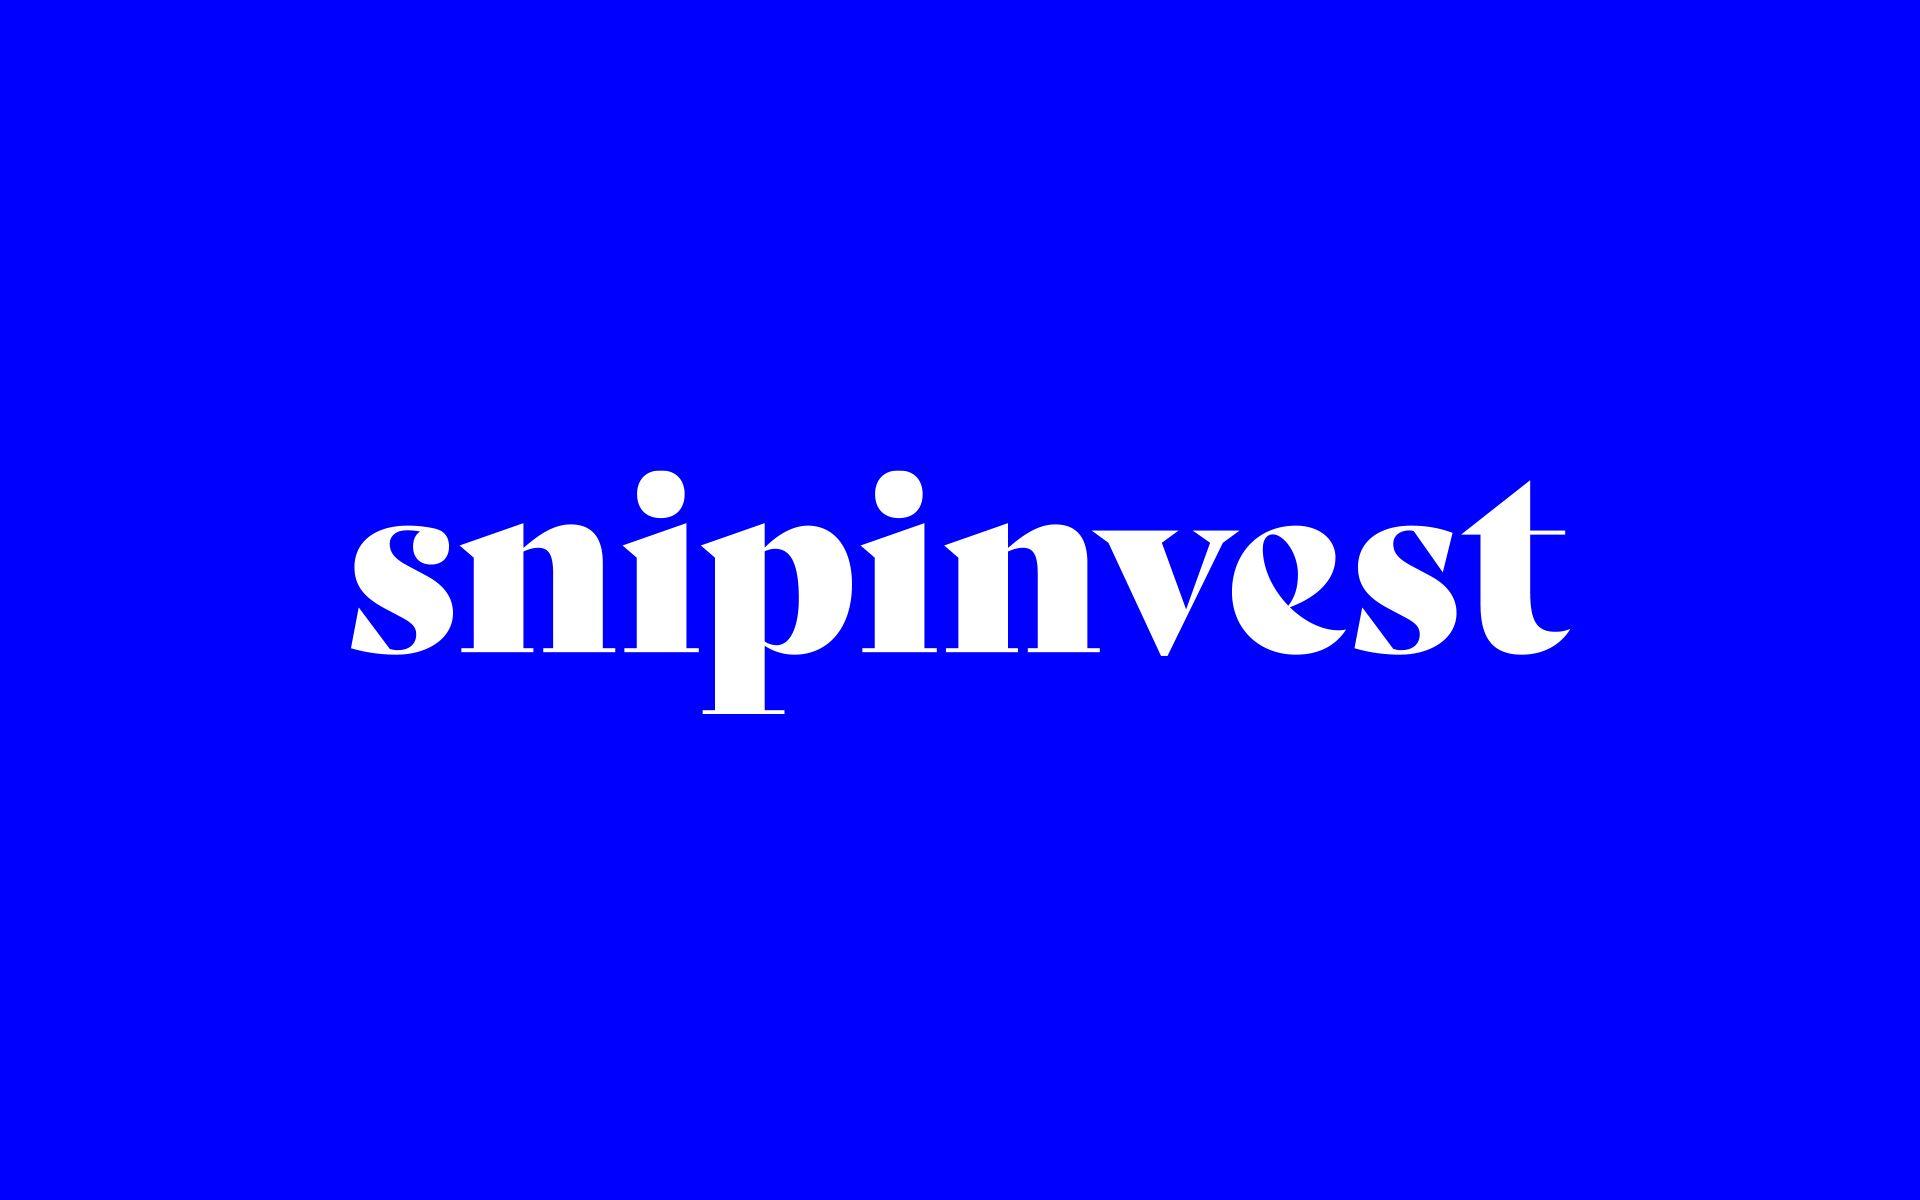 snipinvest Logotype